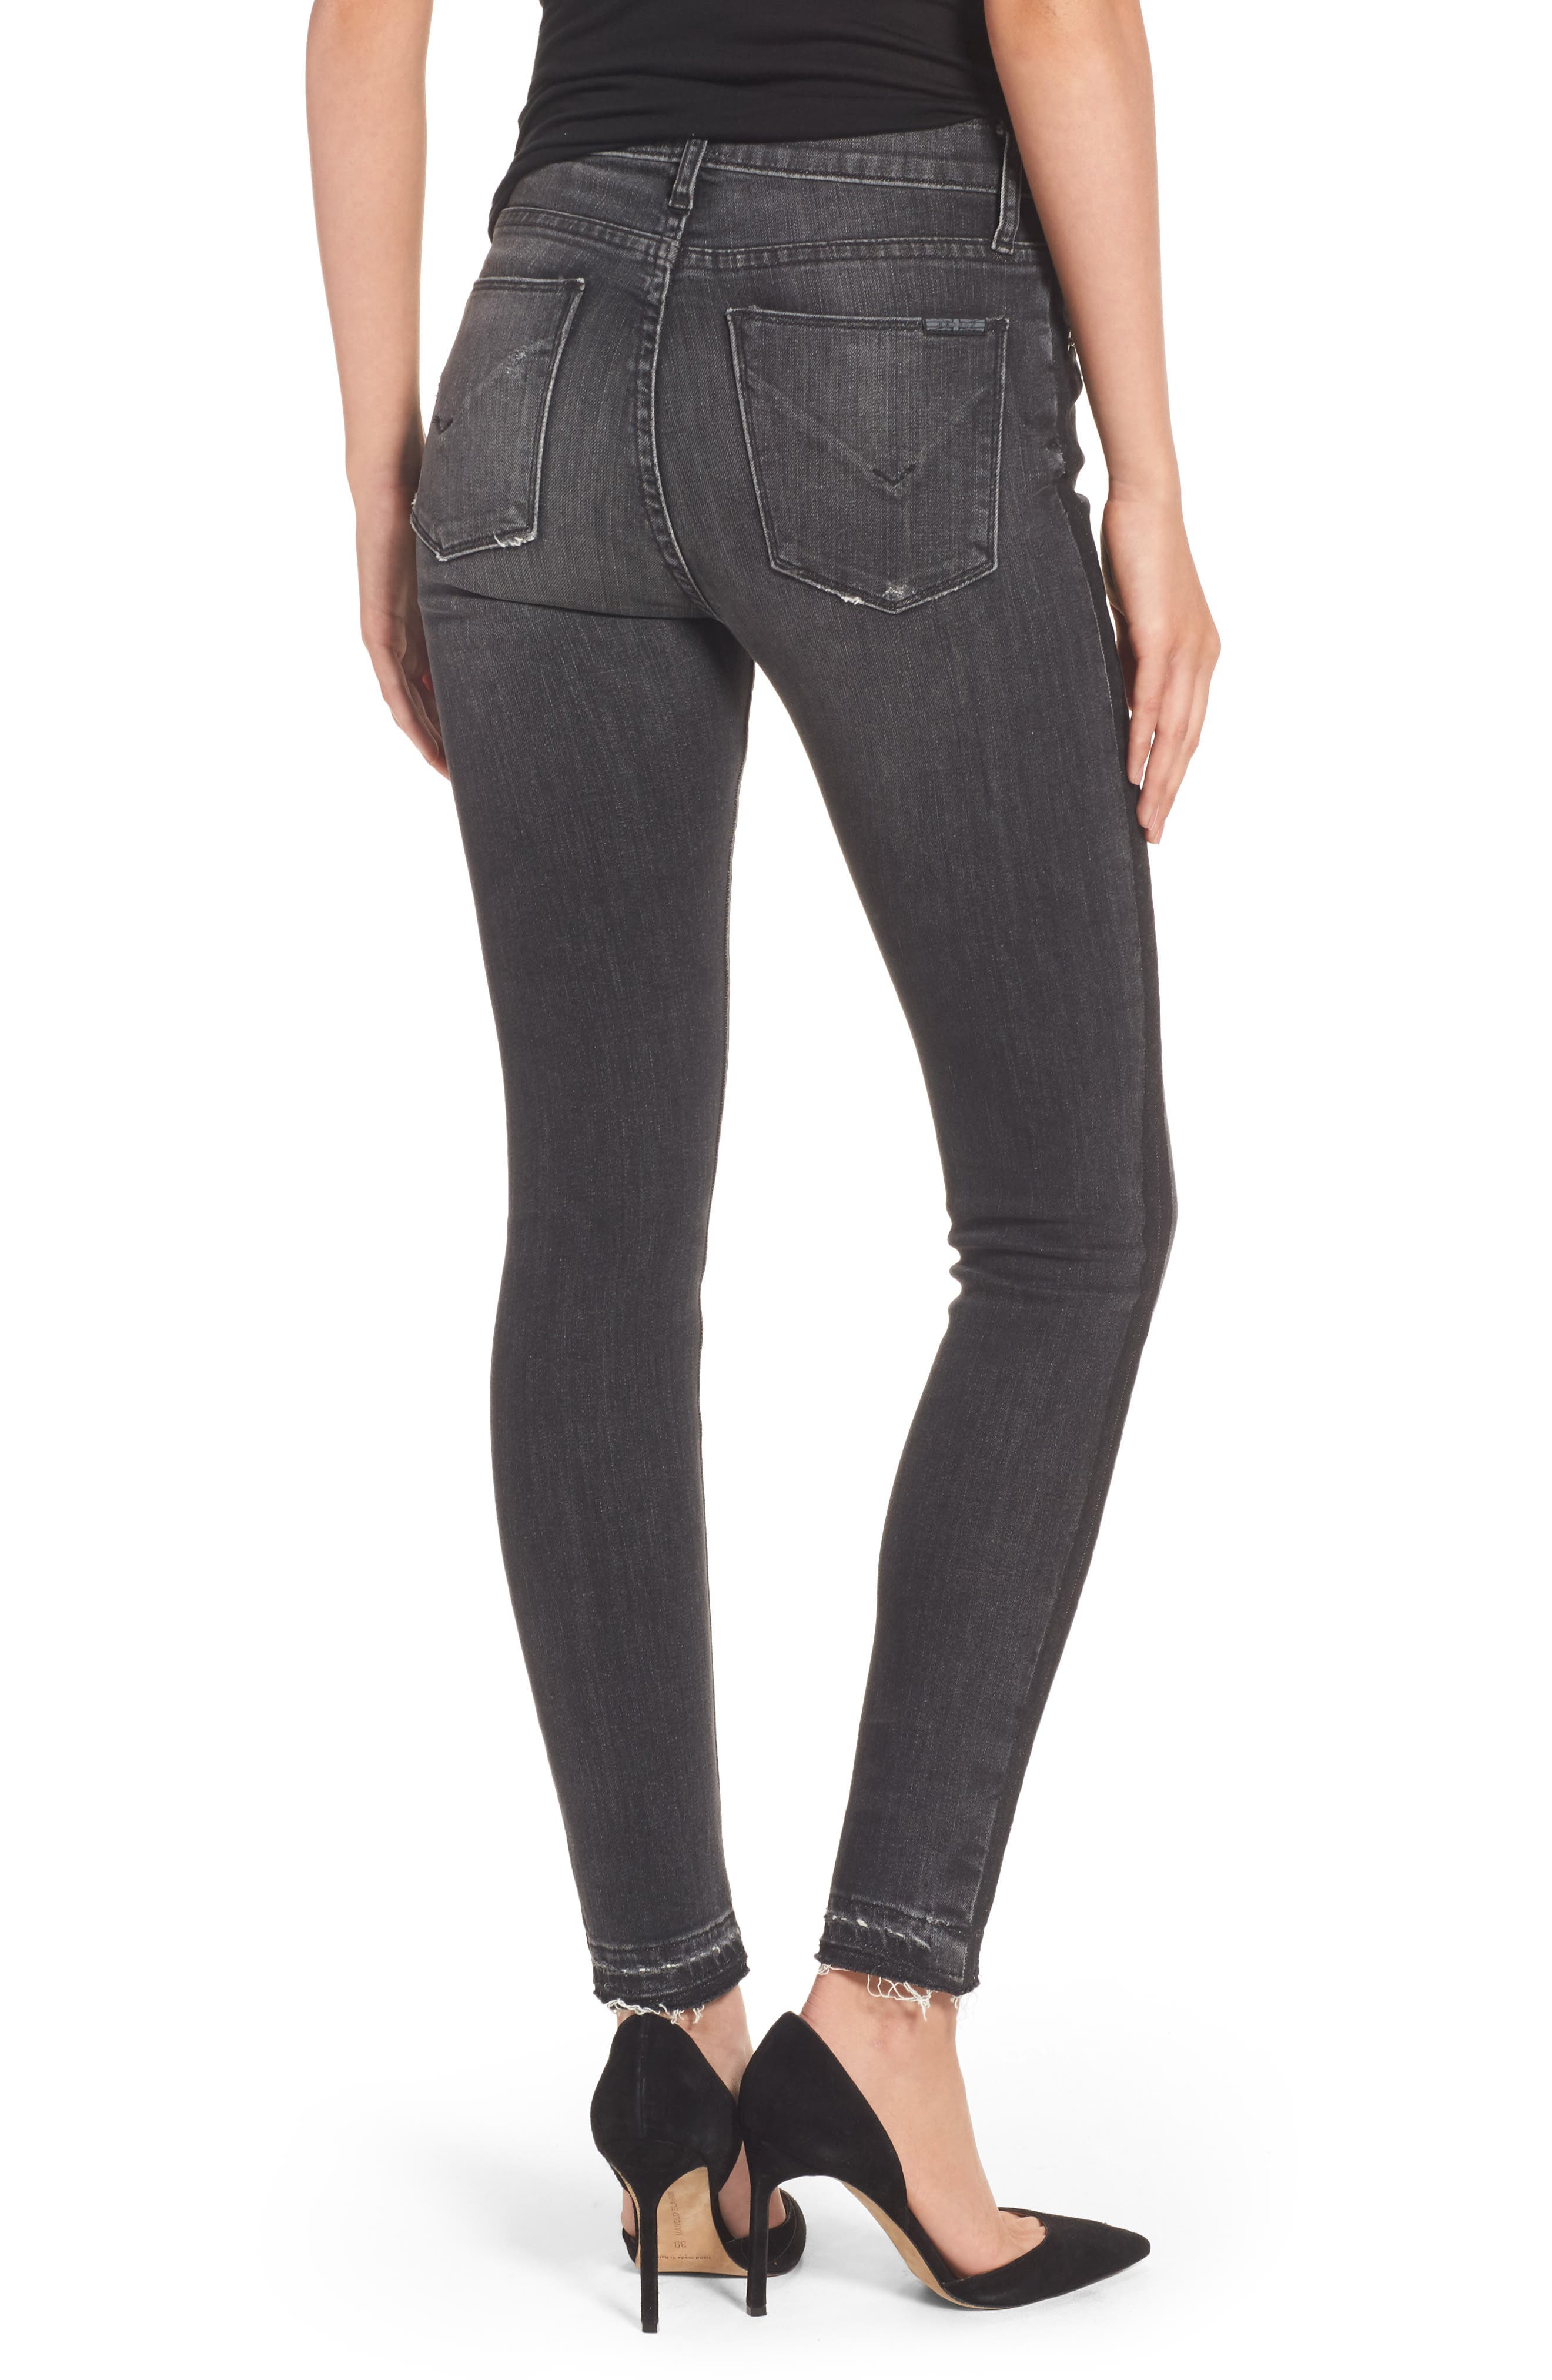 Barbara High Waist Super Skinny Jeans,                             Alternate thumbnail 2, color,                             Onix